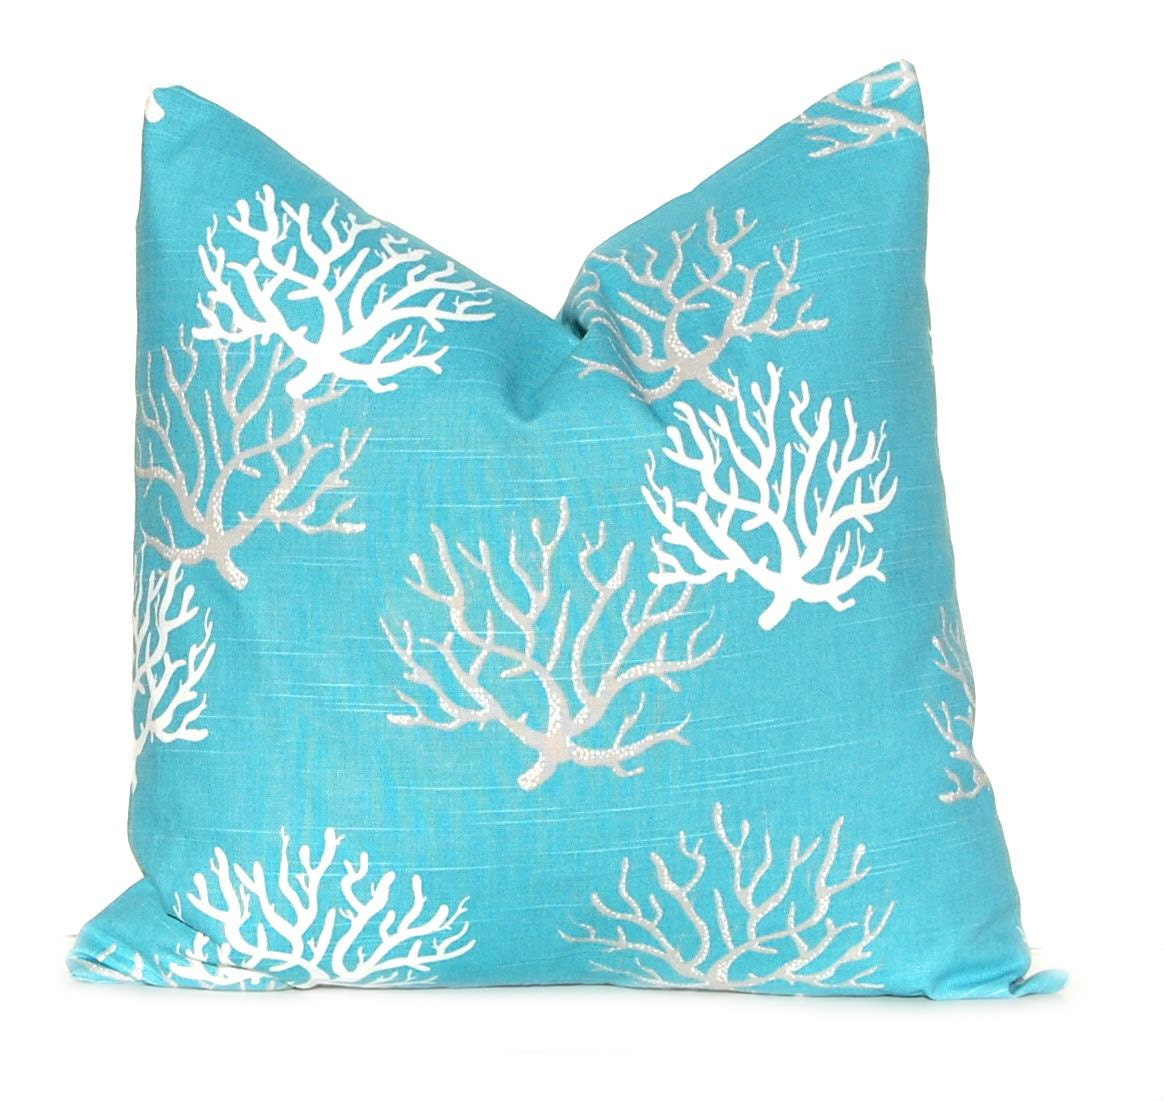 Coastal Decorative Throw Pillows : Decorative Throw Pillow Cover Beach Decor Sea Coral One